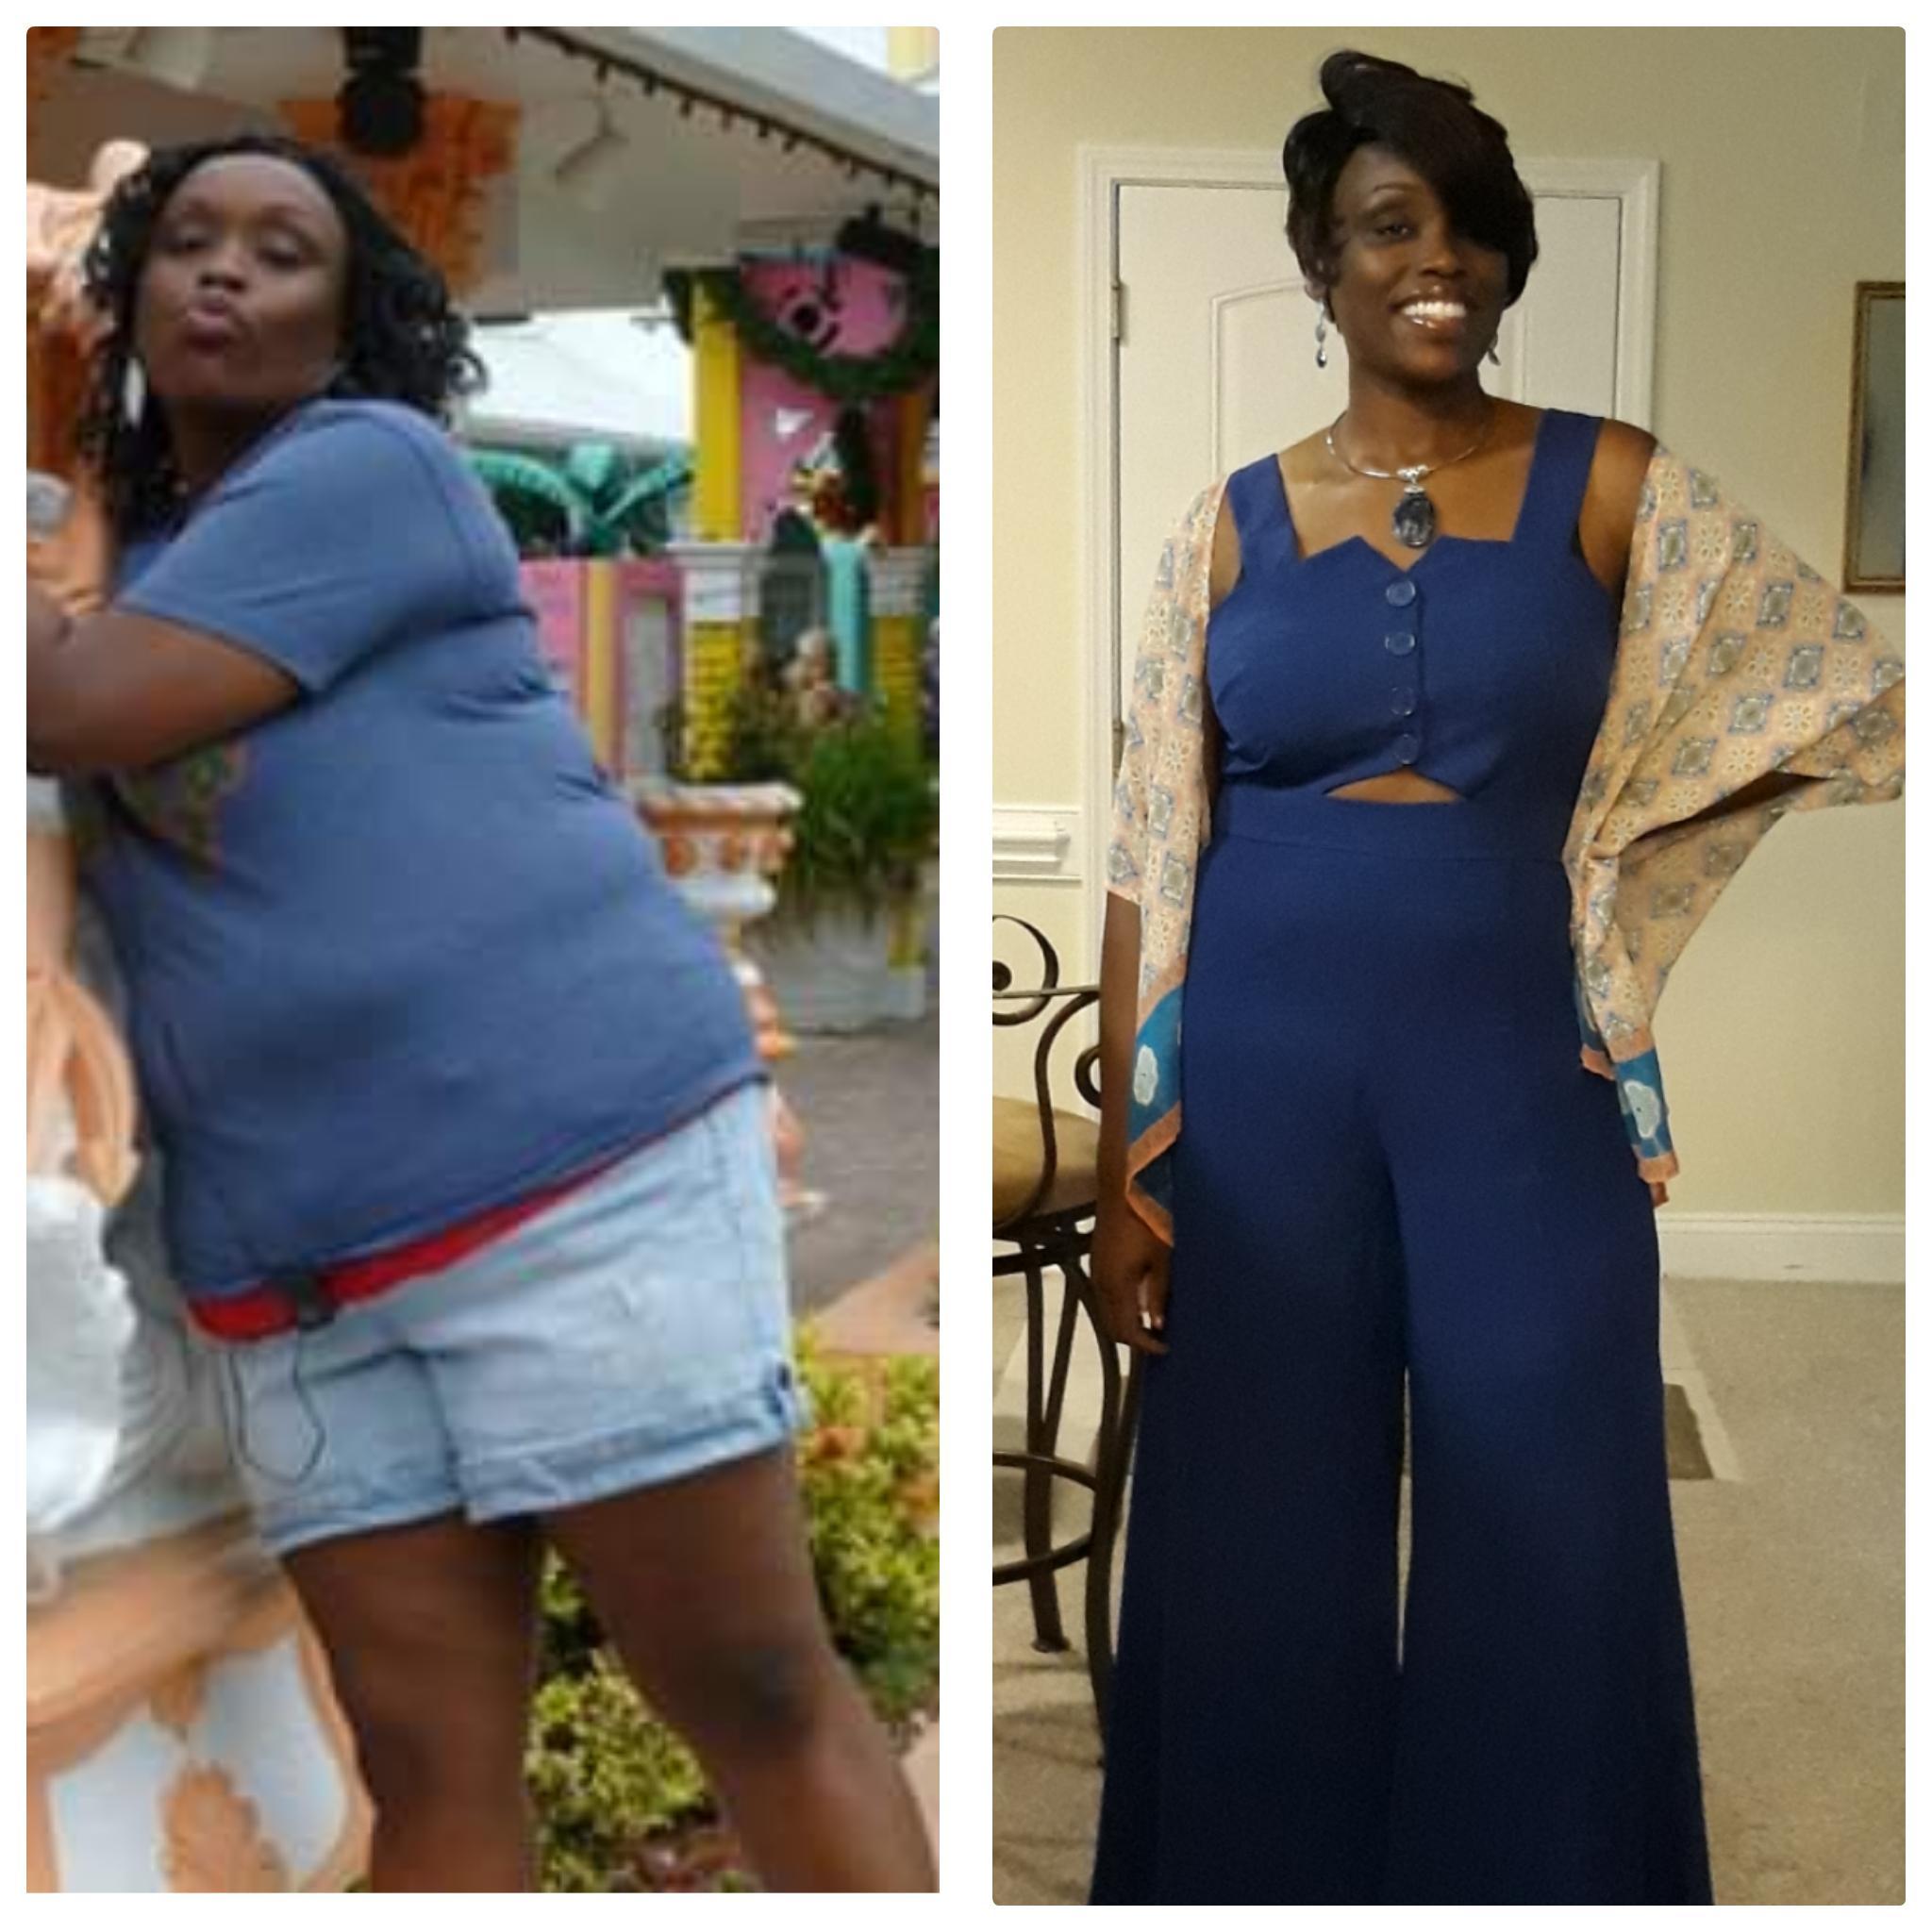 5 feet 9 Female Progress Pics of 97 lbs Weight Loss 282 lbs to 185 lbs